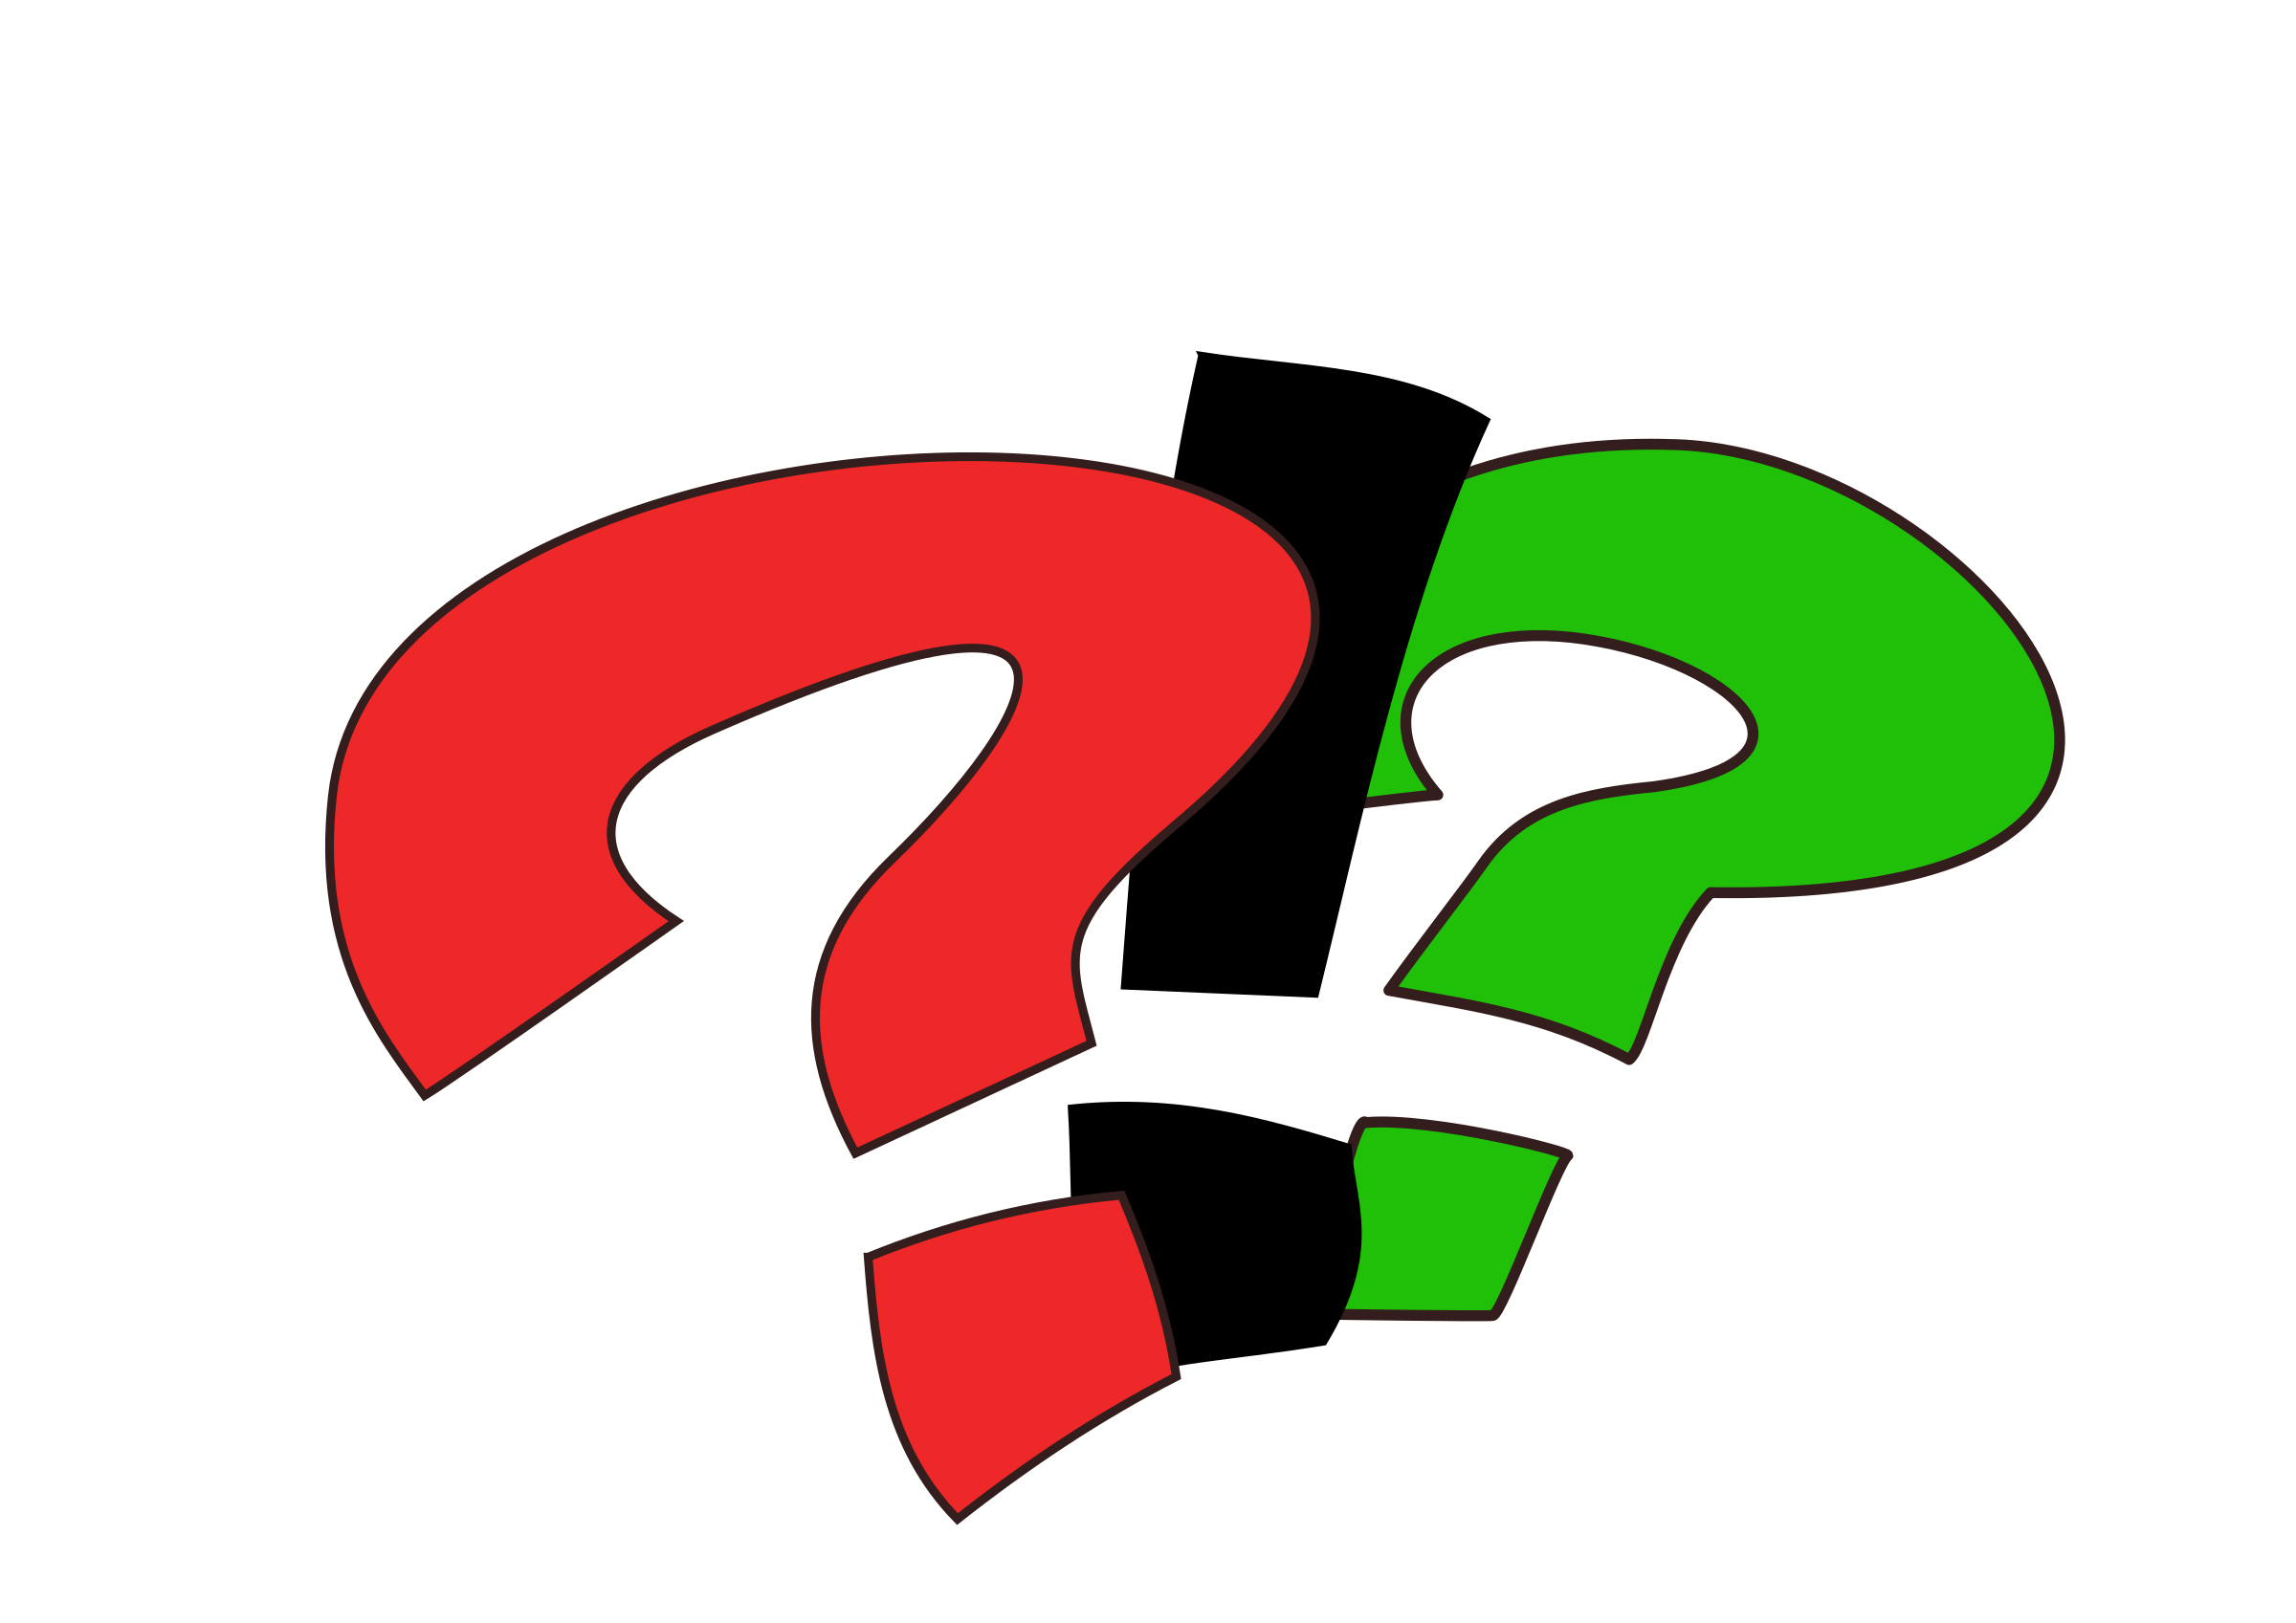 Surprise clipart symbol. Interrogation big image png